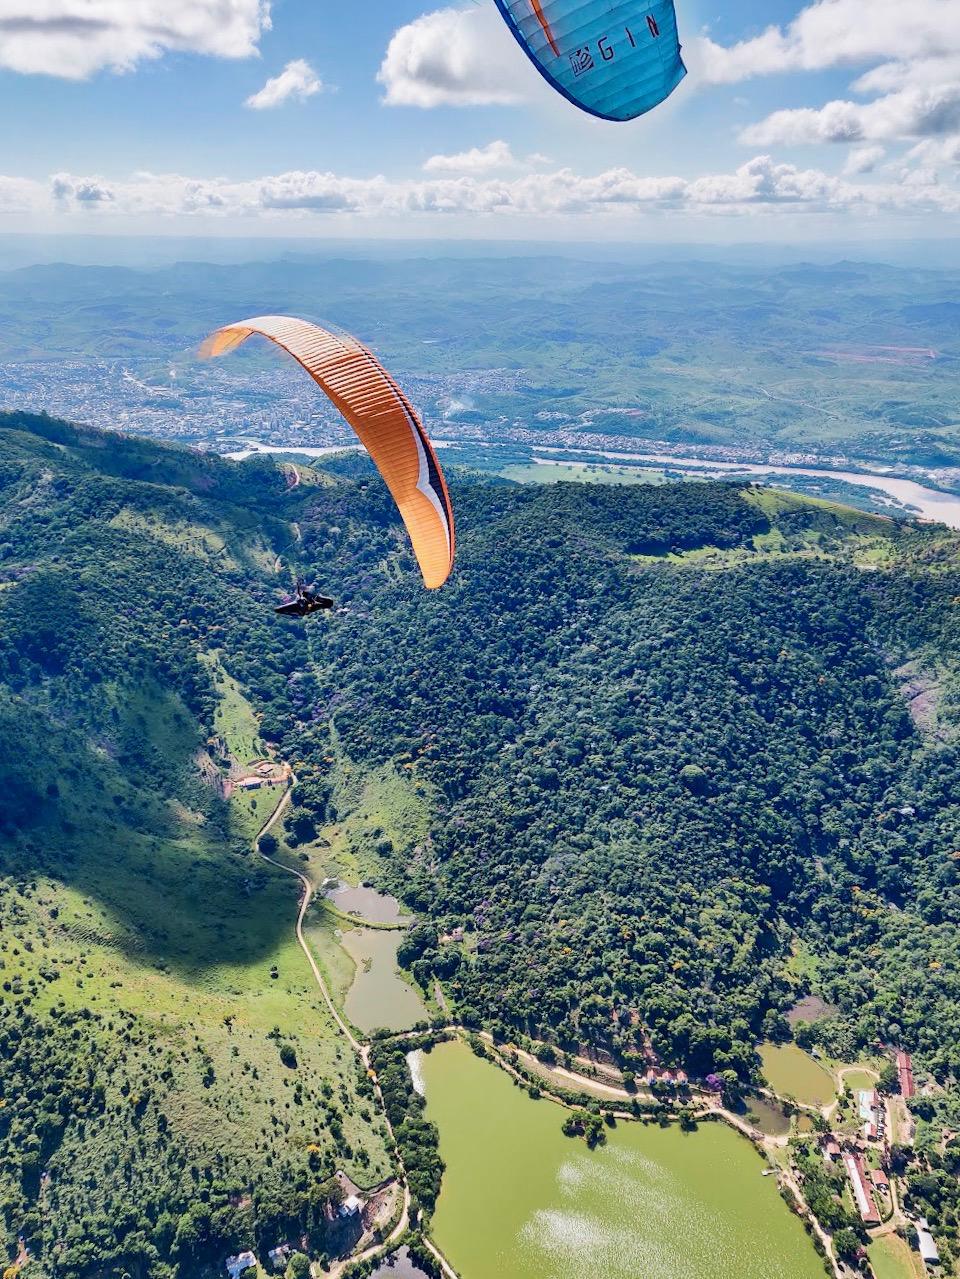 Paragliding in Governador Valadares, Brazil